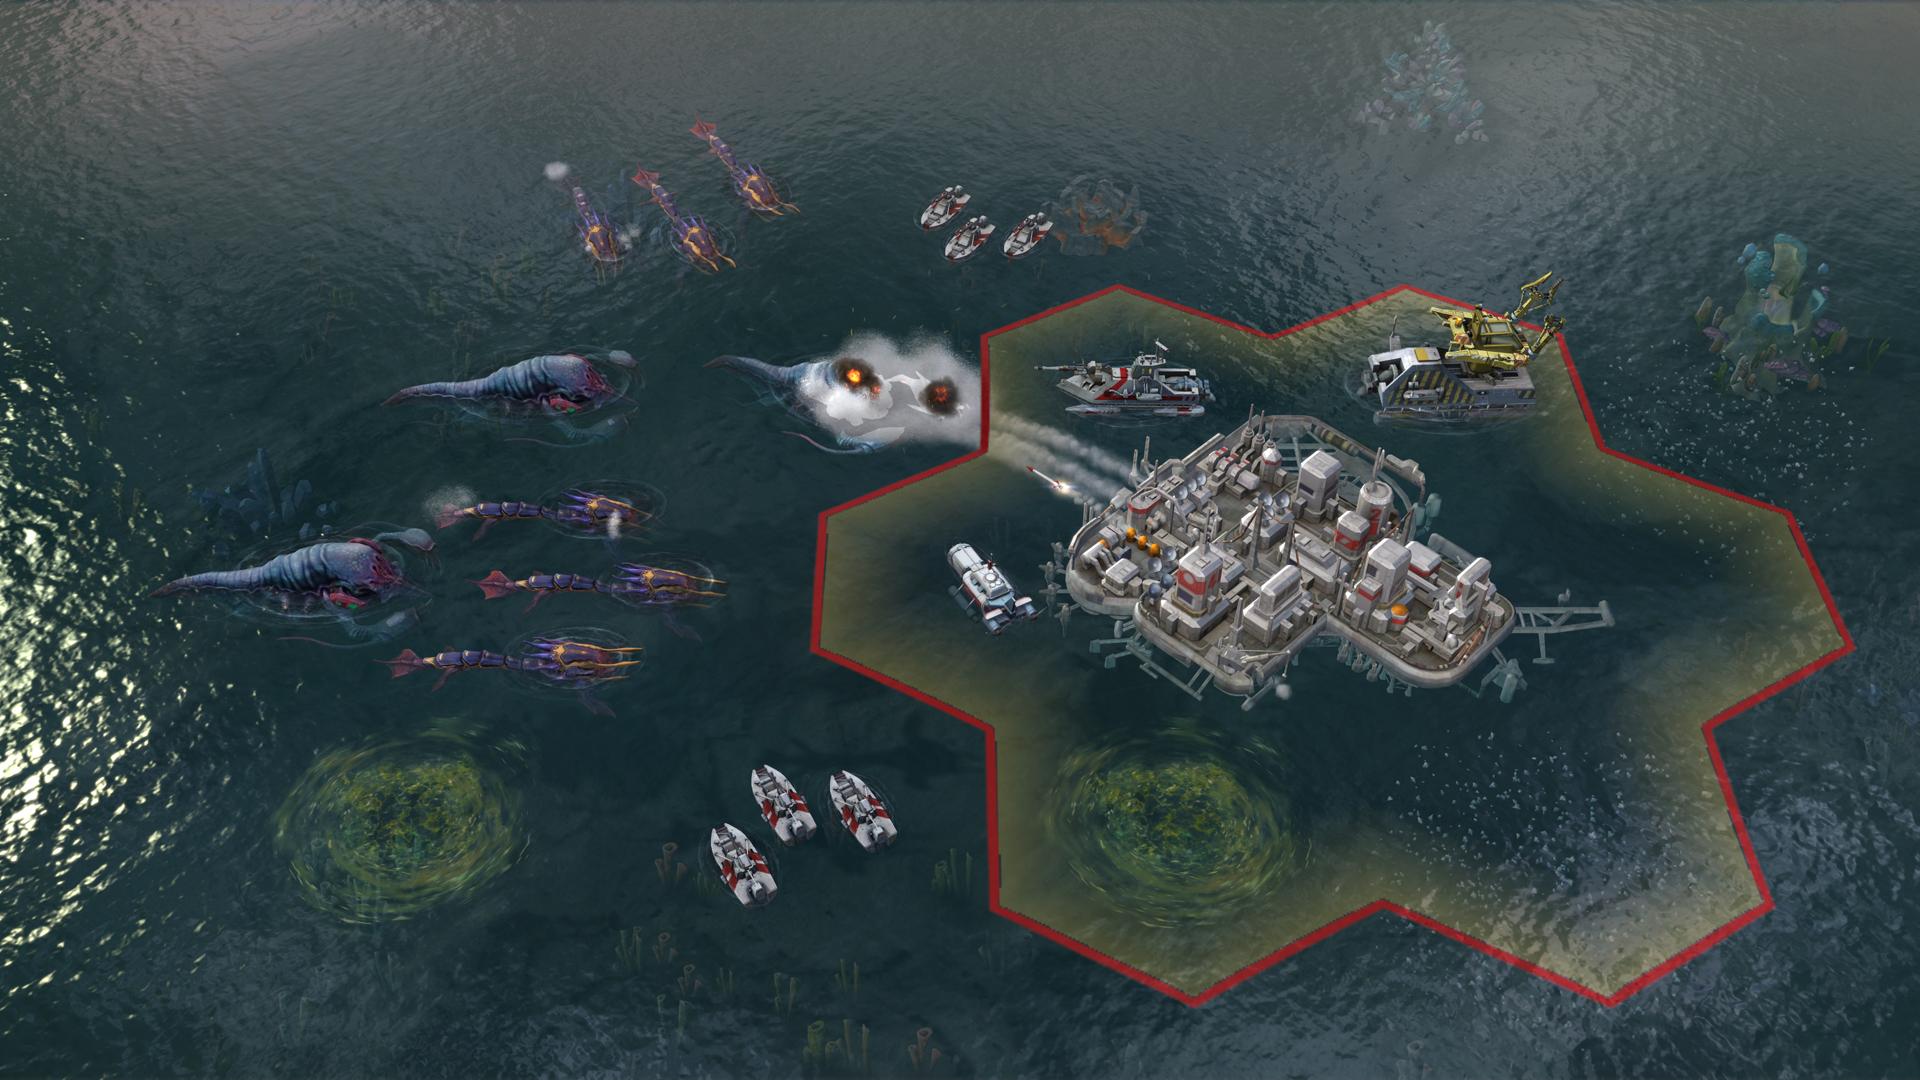 http://www.pcgames.de/screenshots/original/2015/05/Civilization_Beyond_EarthRising_Tide_3-pc-games.jpg